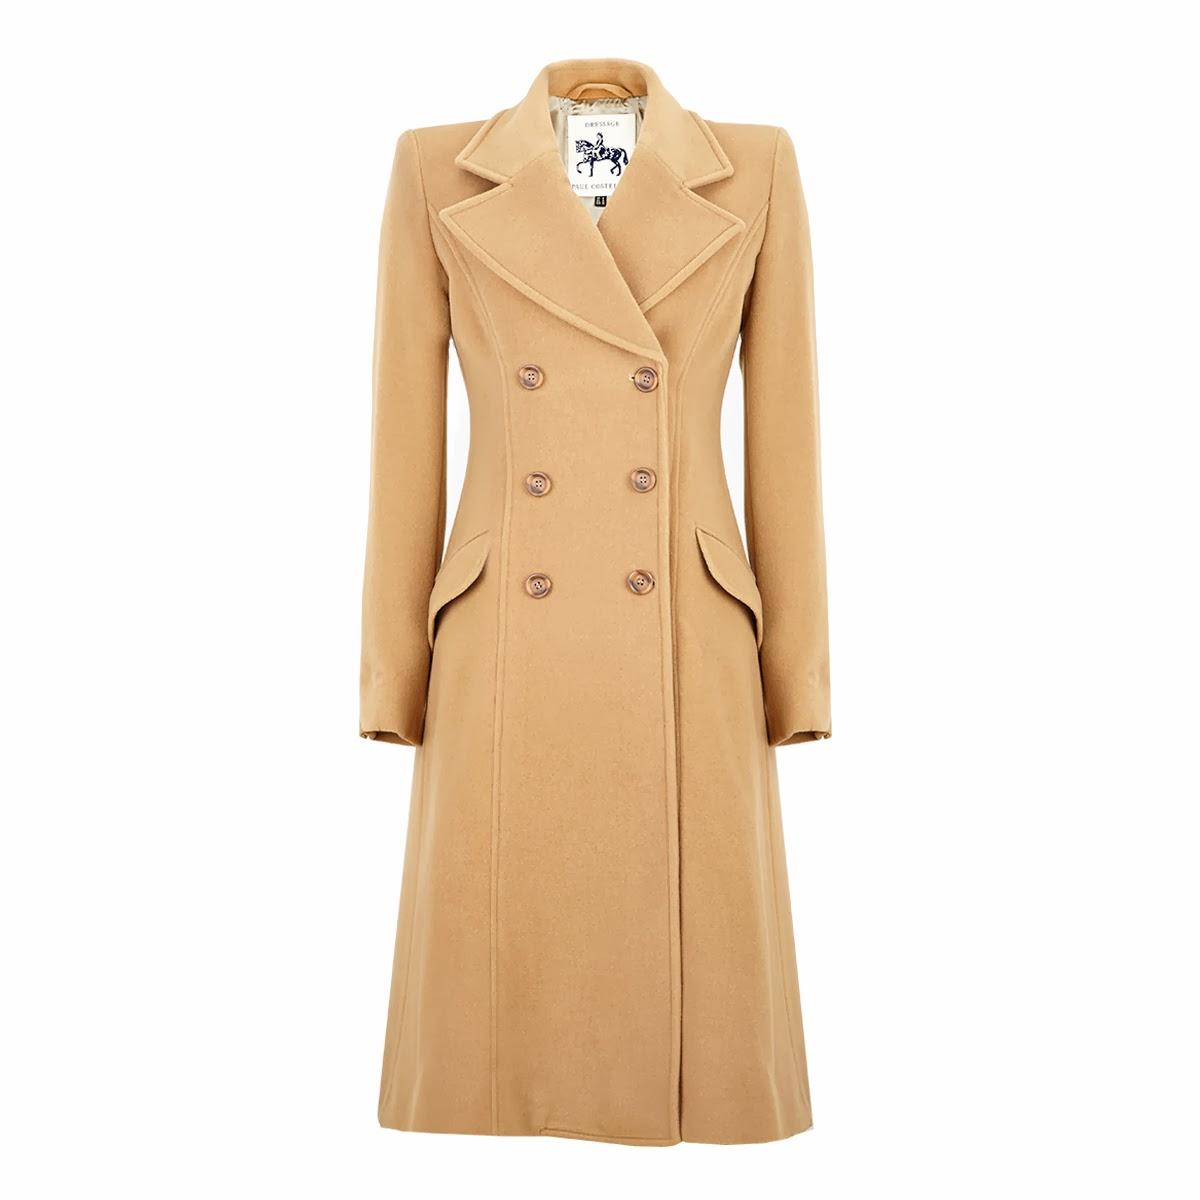 Sassiedoll Paul Costelloe Coat Collection For Arnotts 2013